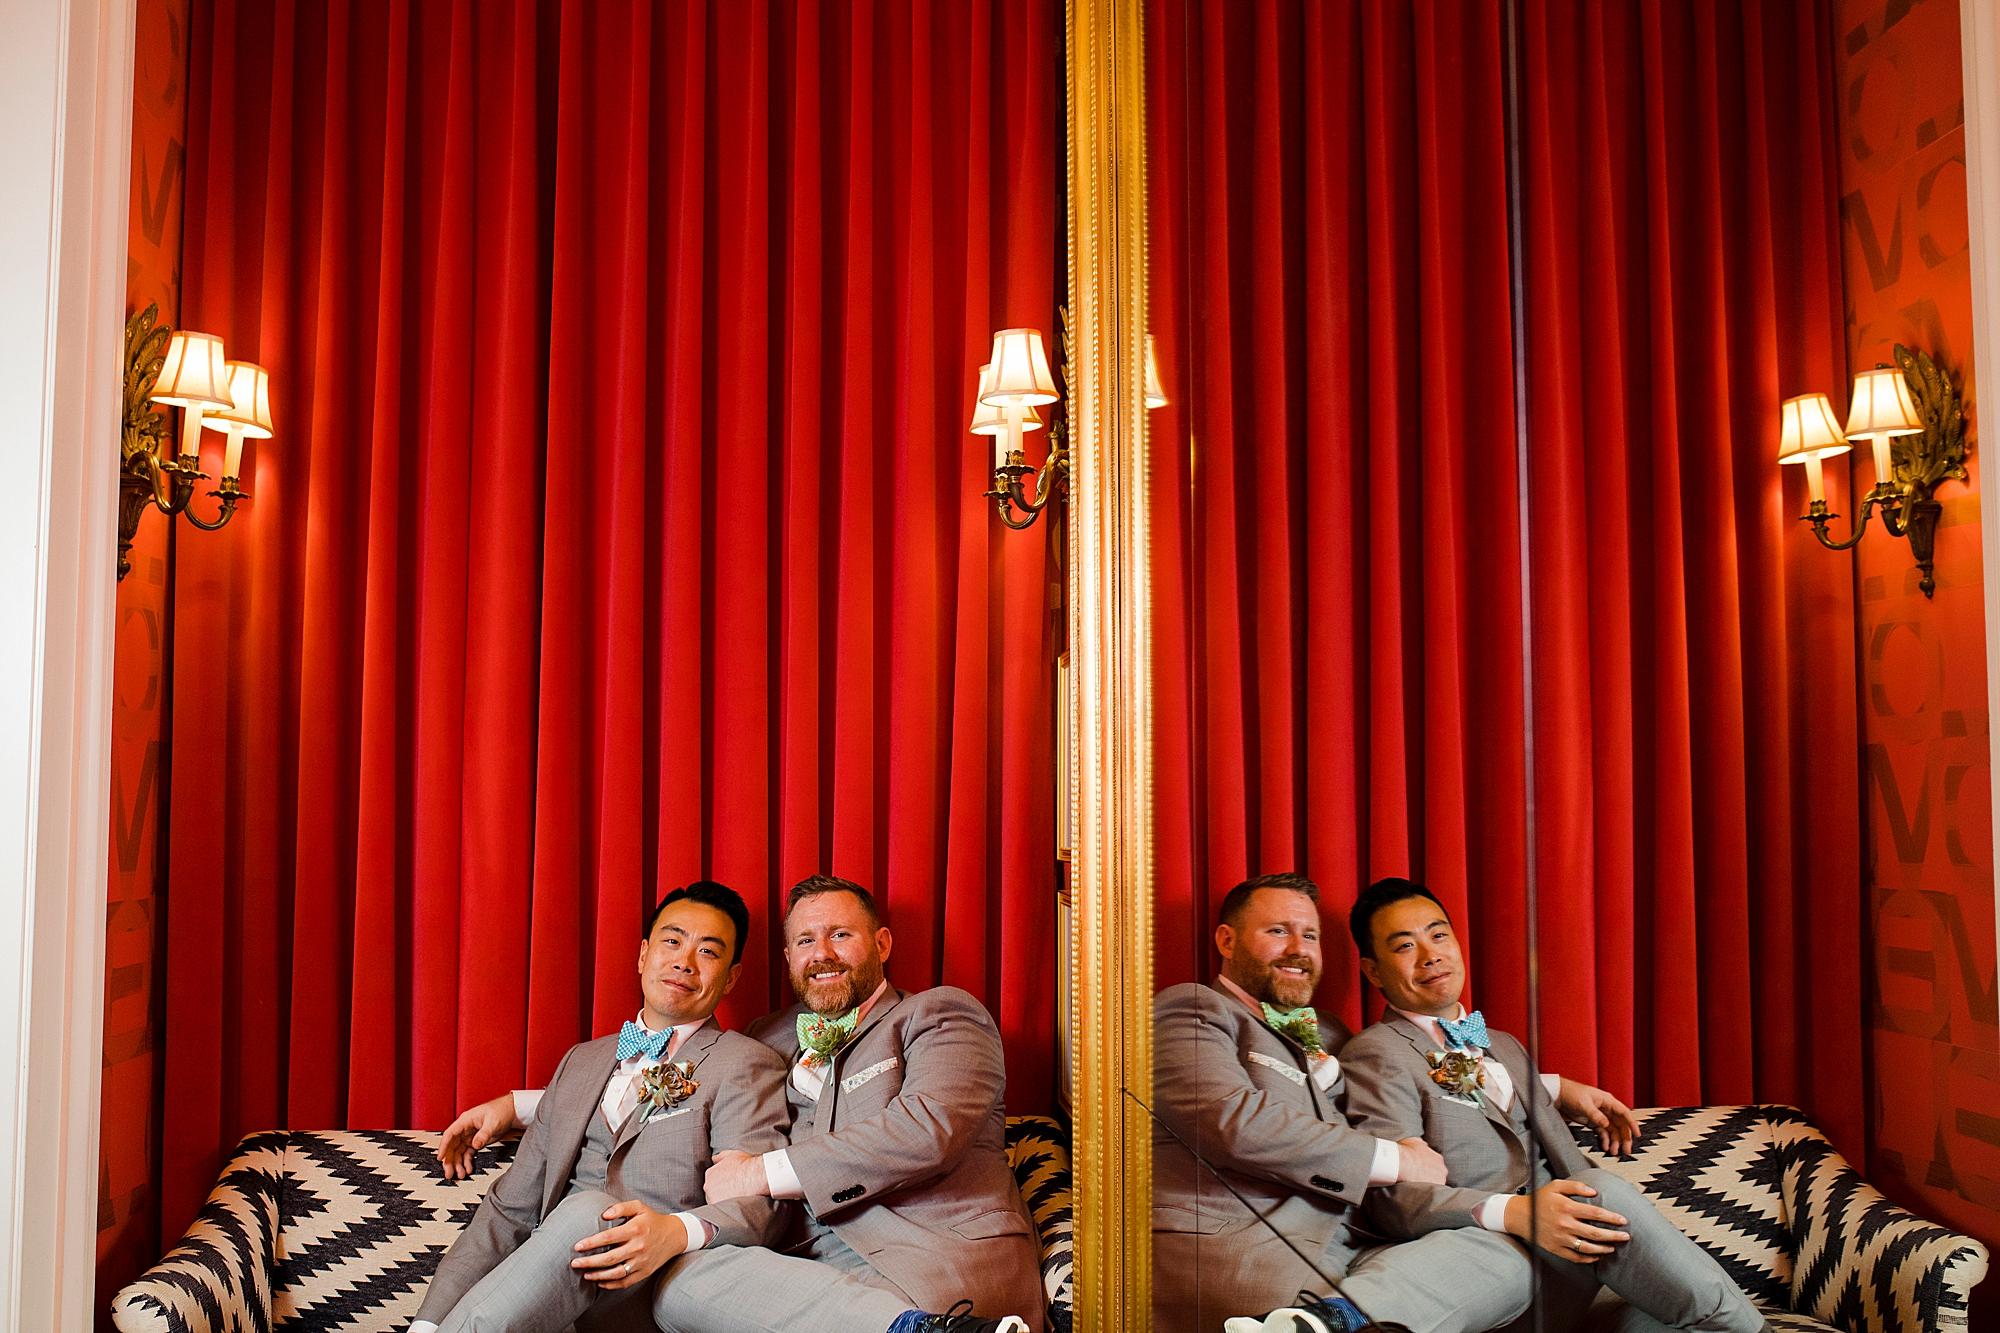 Dan_and_Byron_Love_by_Joe_Mac_Philadelphia_Wedding_LGBTQ_Photography_Gay_Independence_visitor_Center_57.JPG